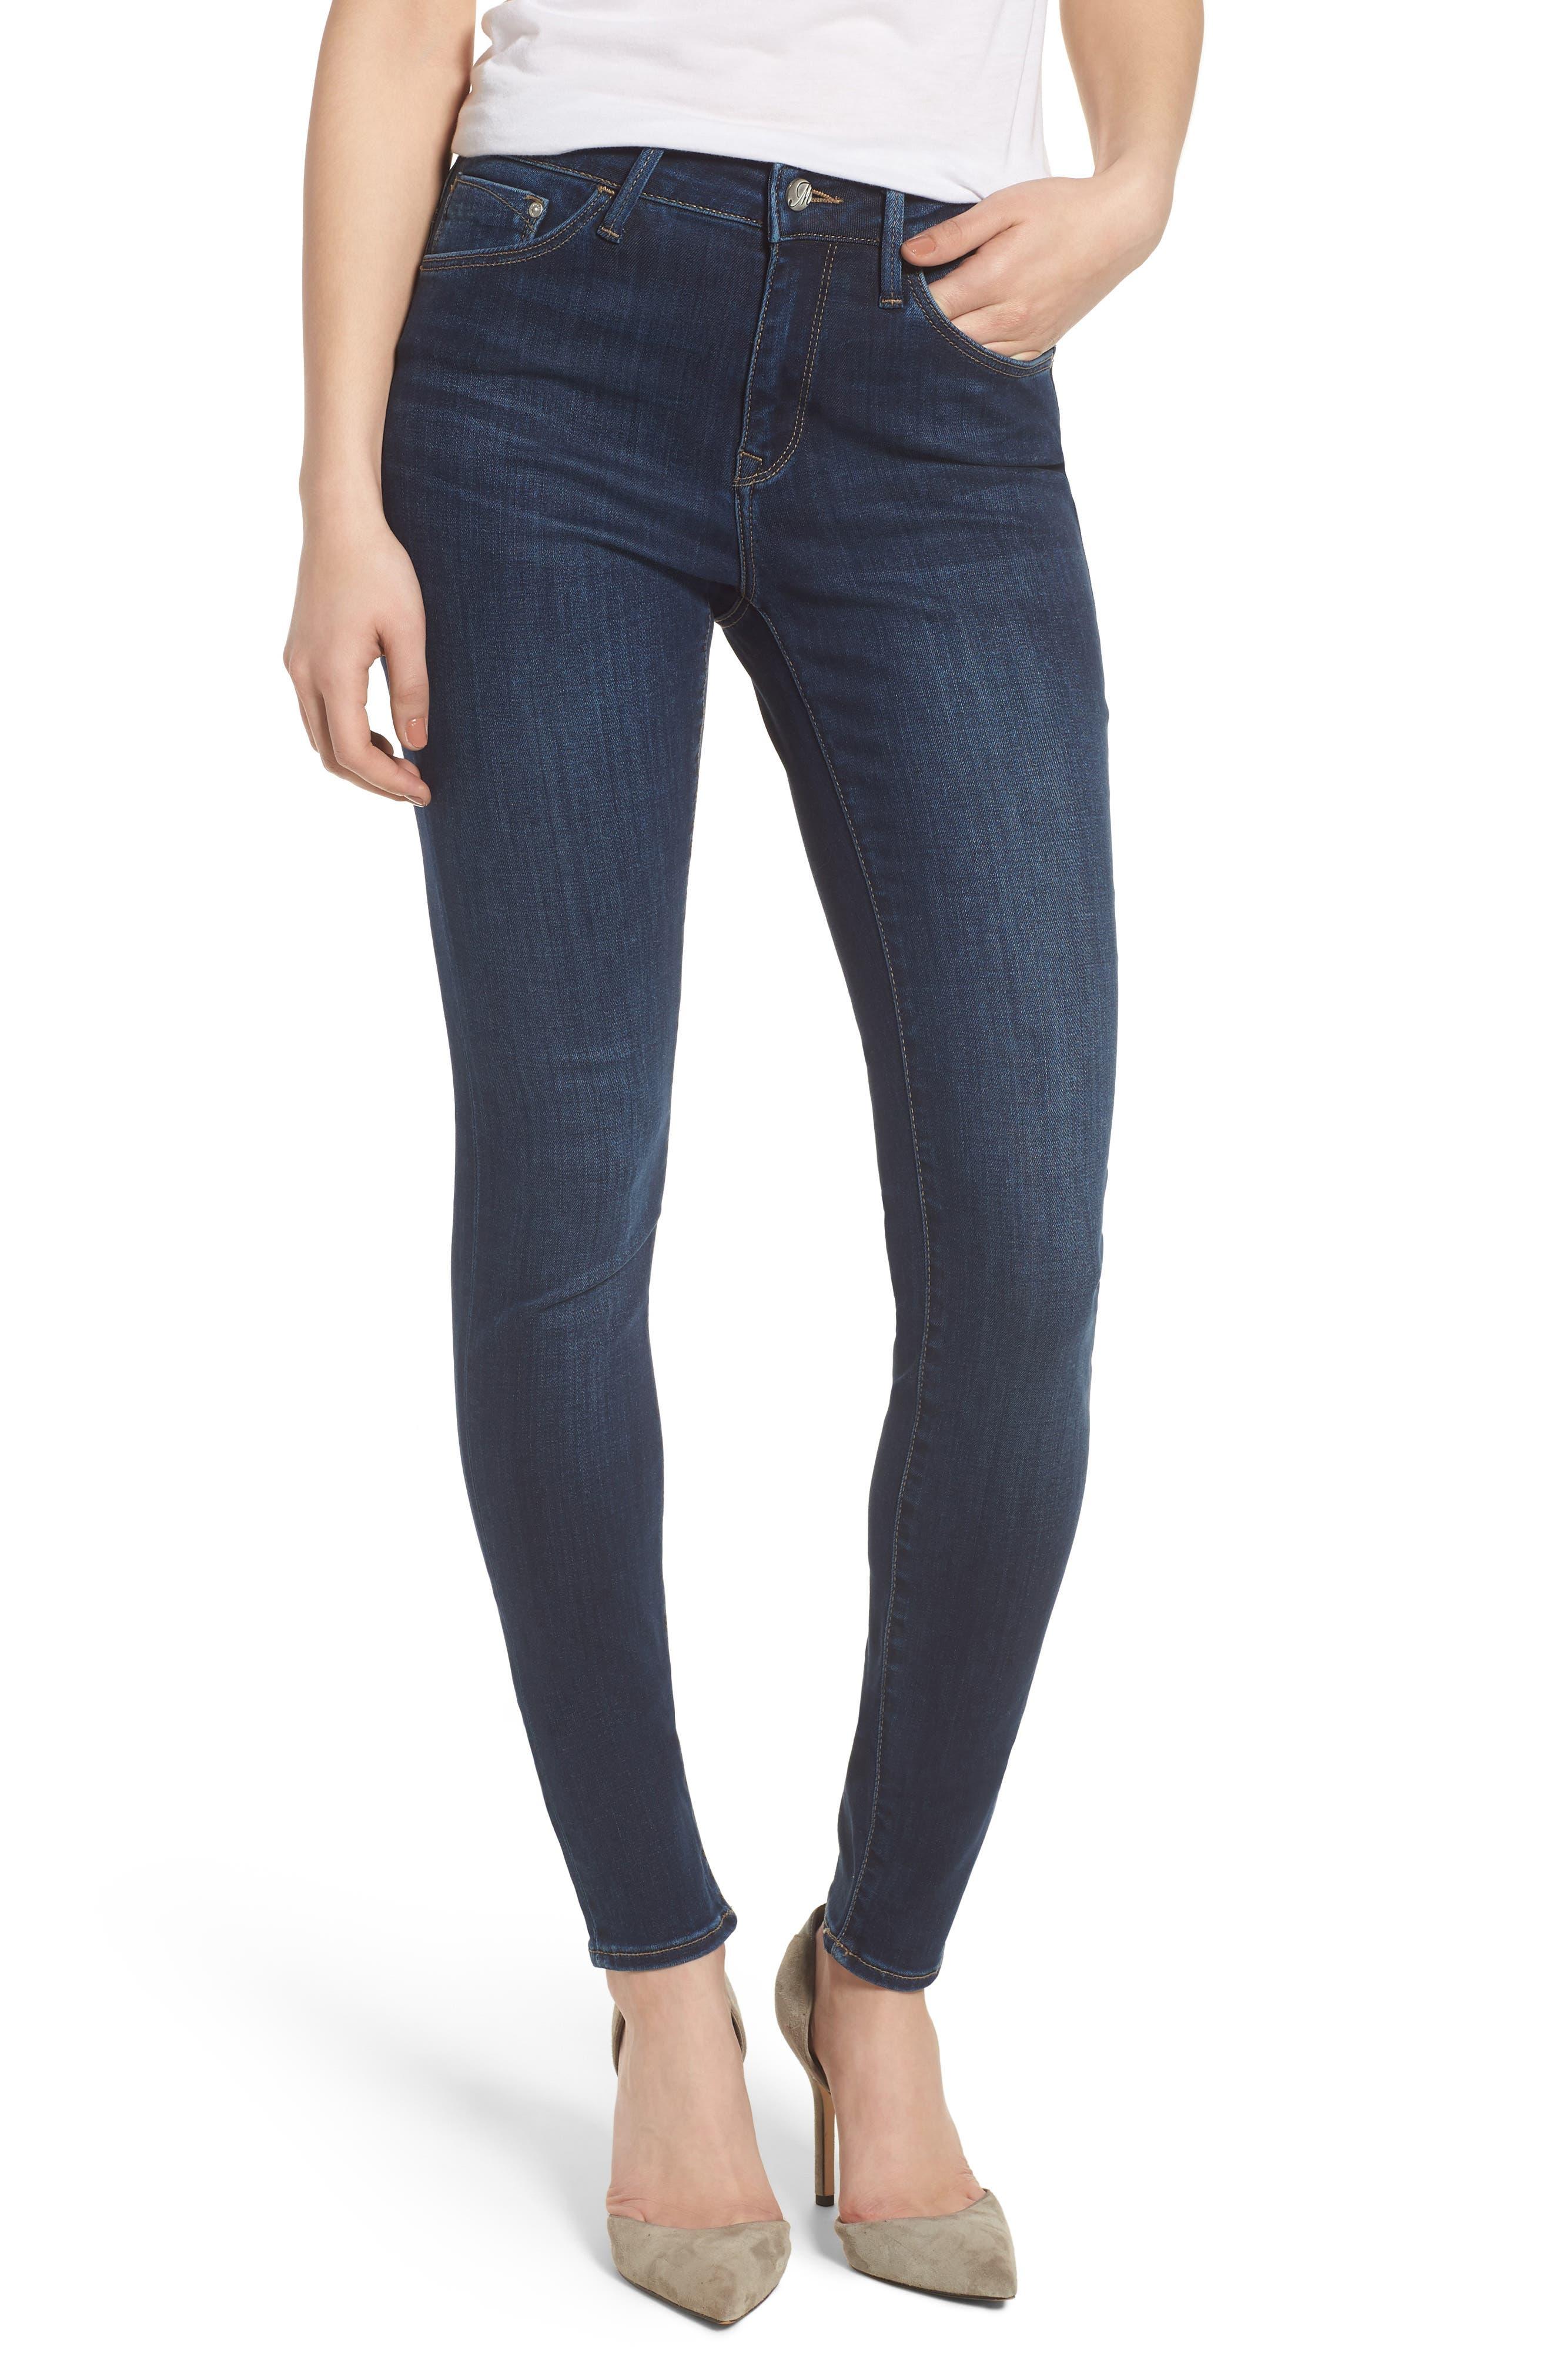 Alternate Image 1 Selected - Mavi Jeans Alissa Skinny Jeans (Dark Supersoft)